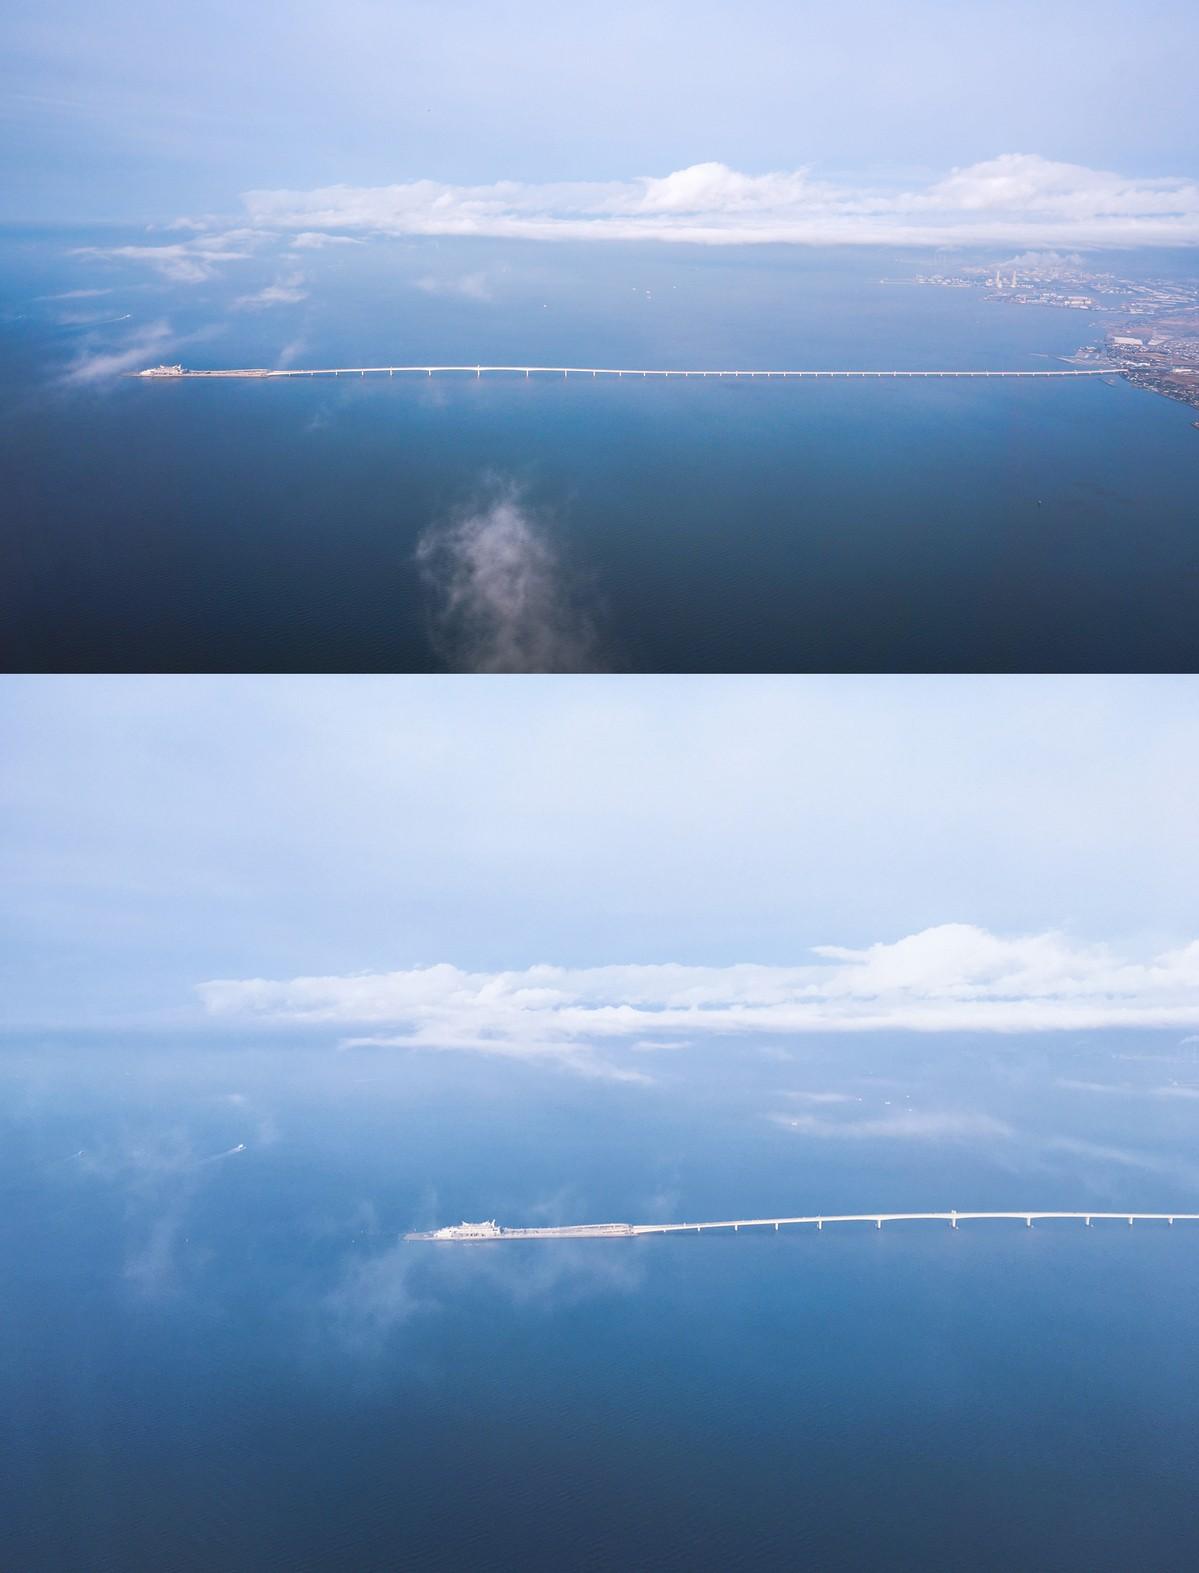 Re: [原创]【 寰球十万八千里 | 中集 | 耶路撒冷 】 BOEING 777-300ER JA735J 空中